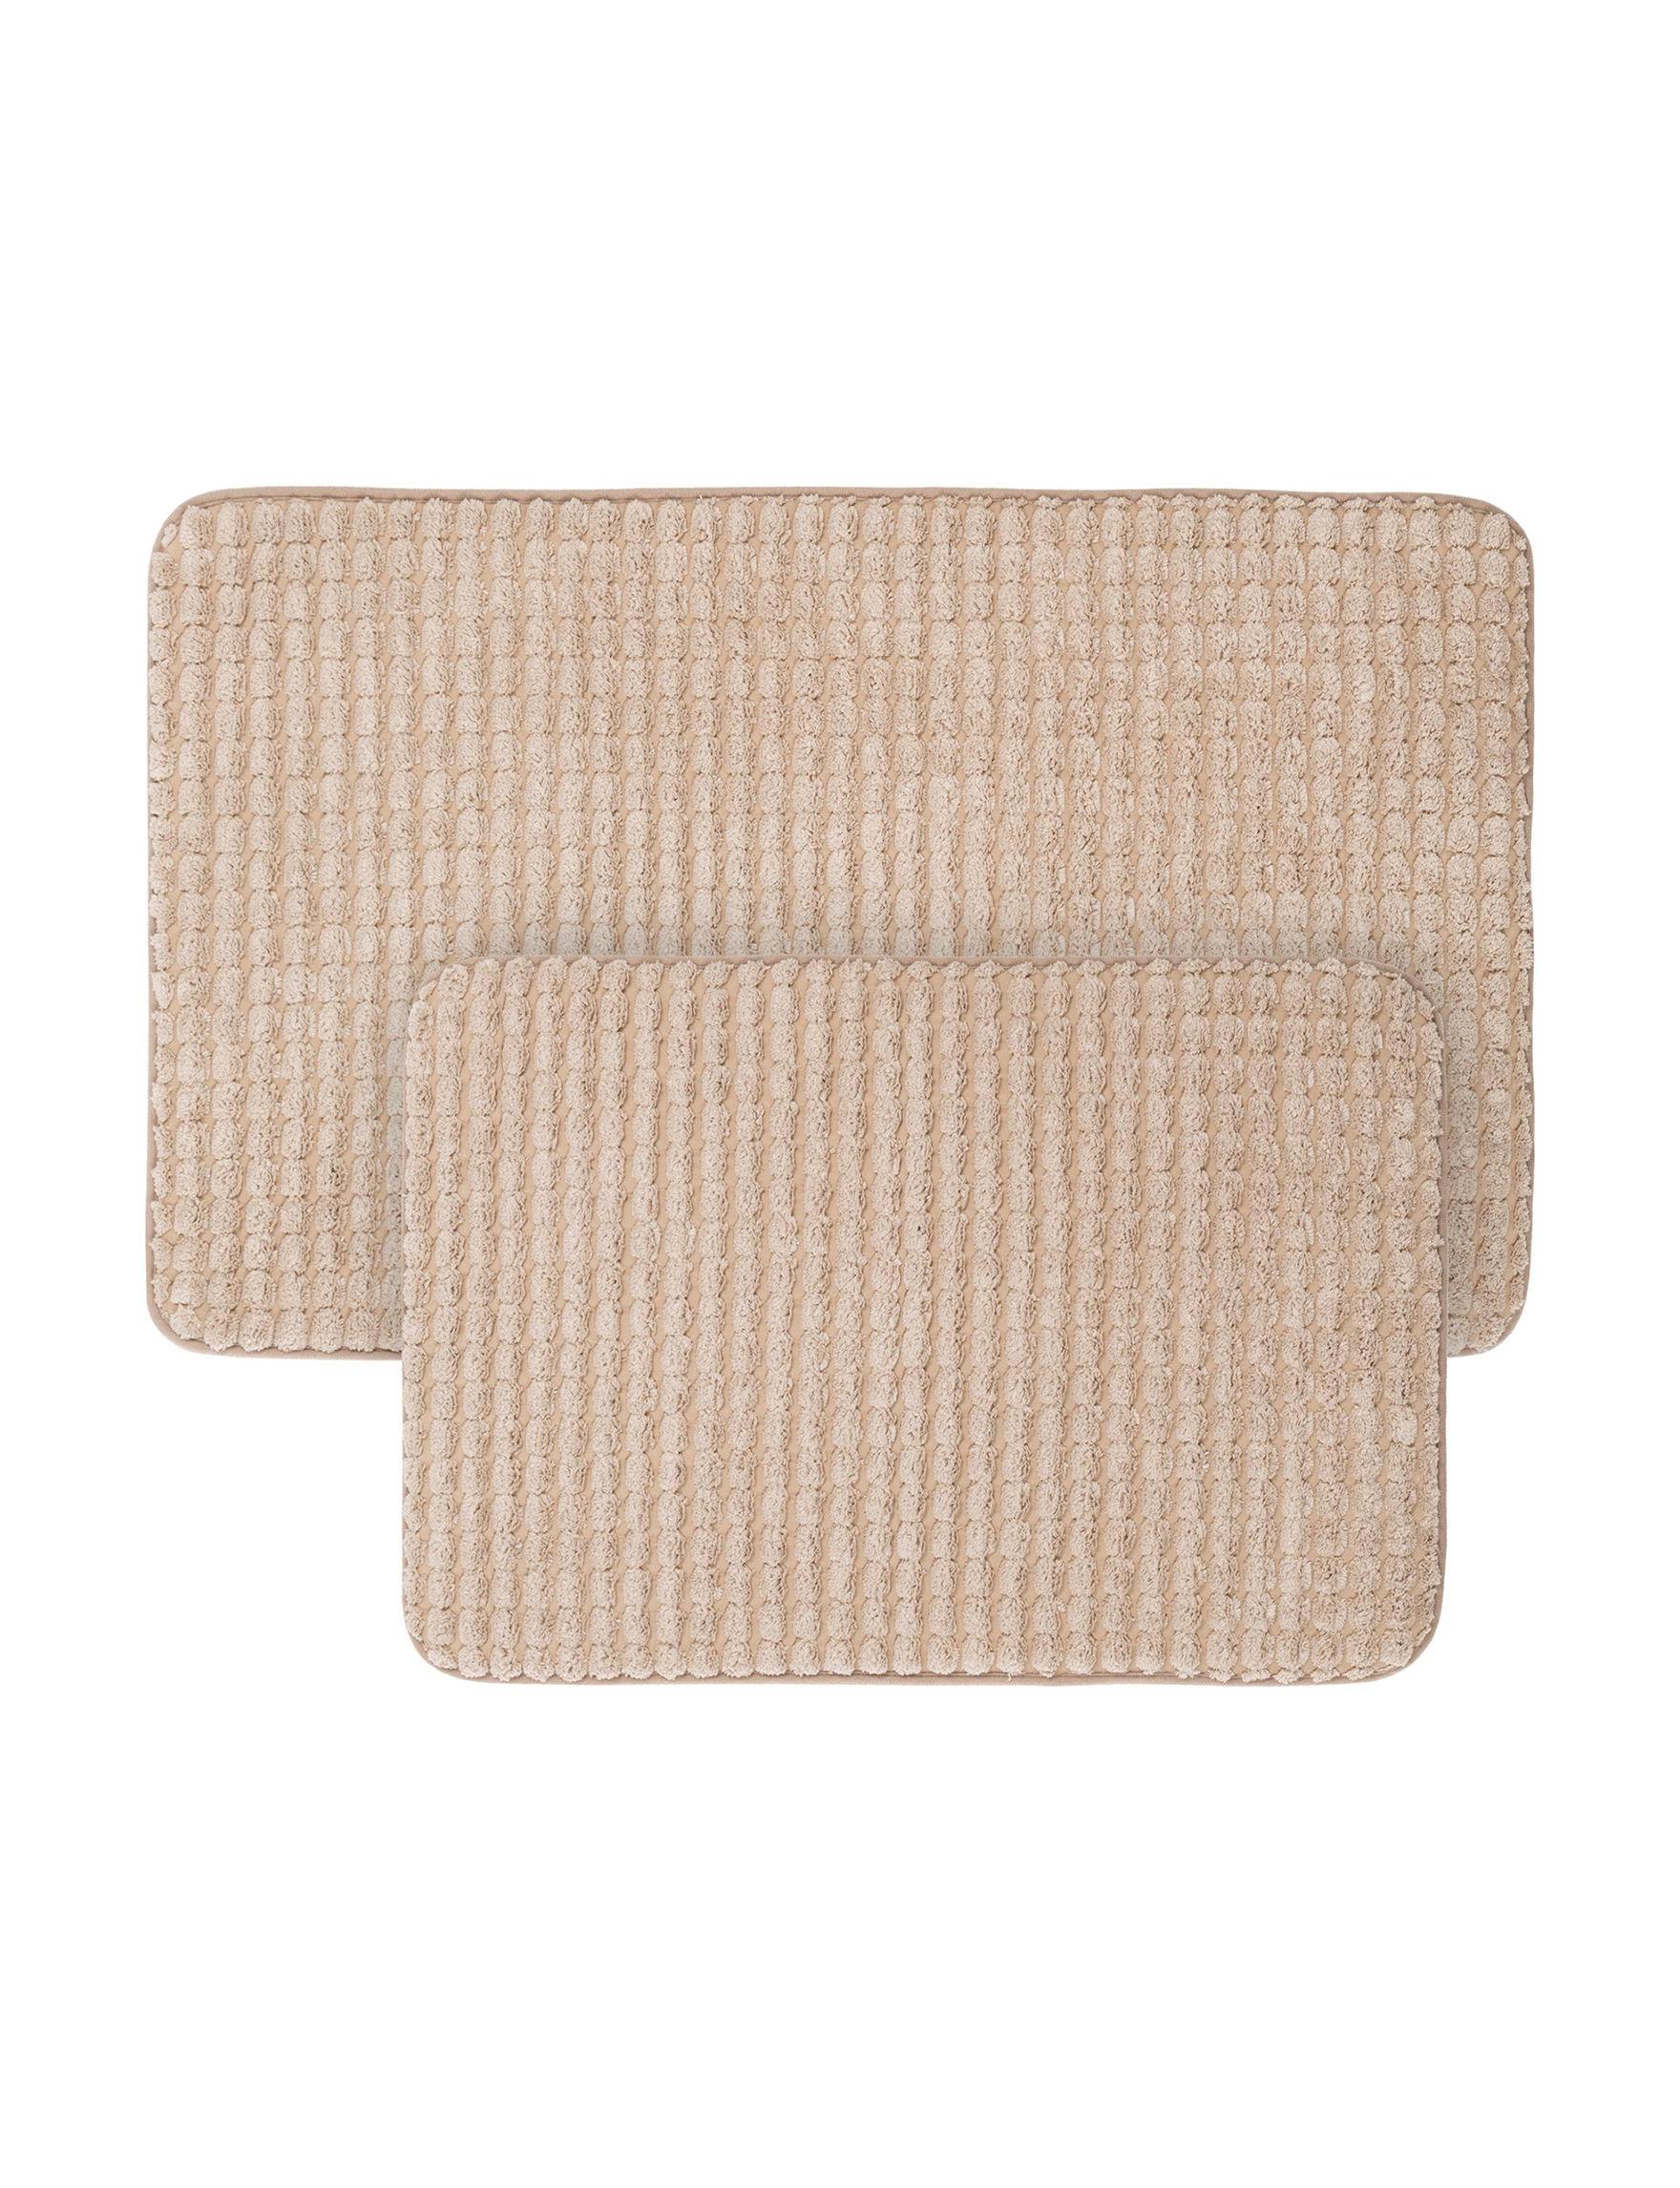 Lavish Home Taupe Bath Rugs & Mats